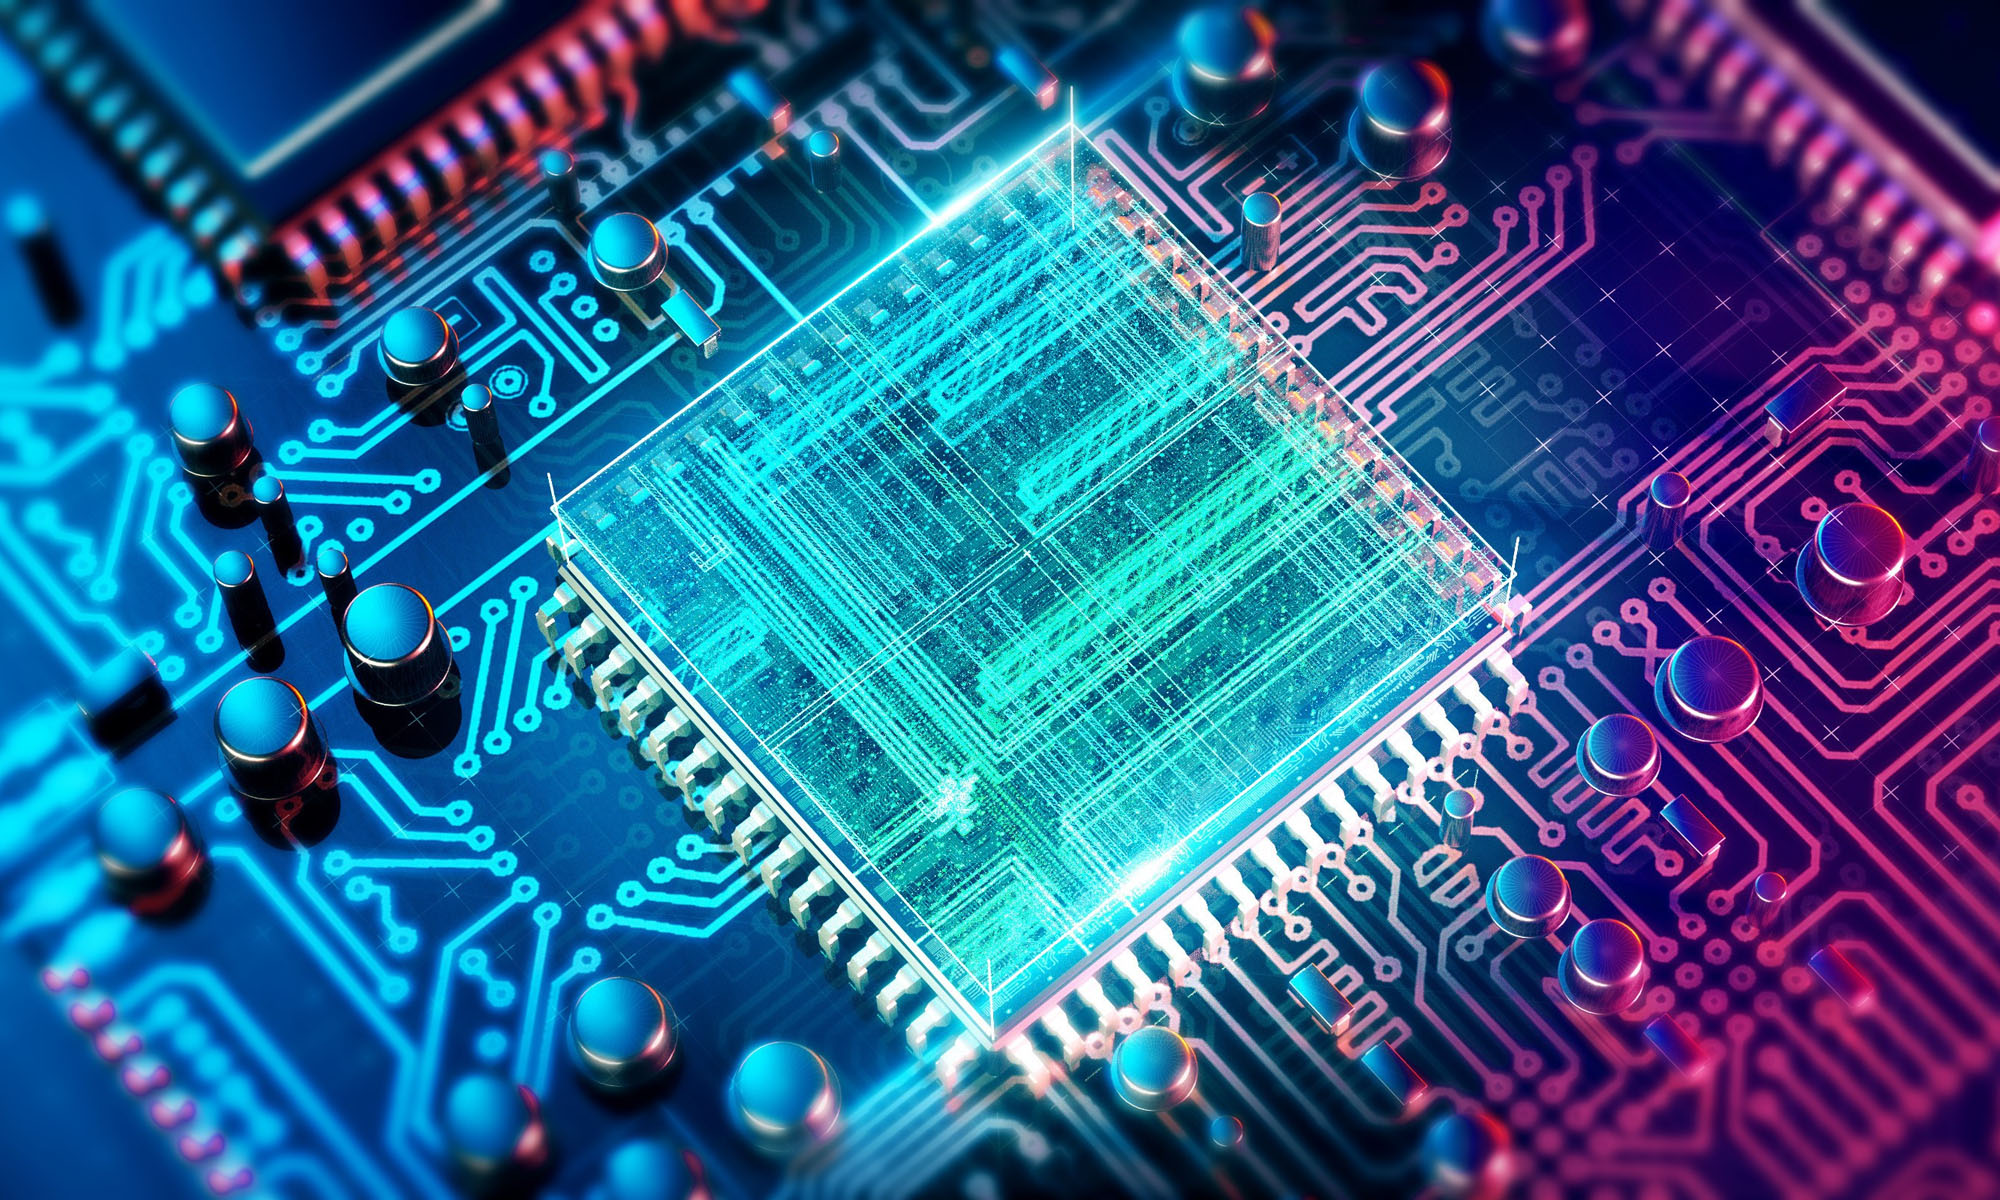 saudi researchers use quantum computing to design more efficient airplanes